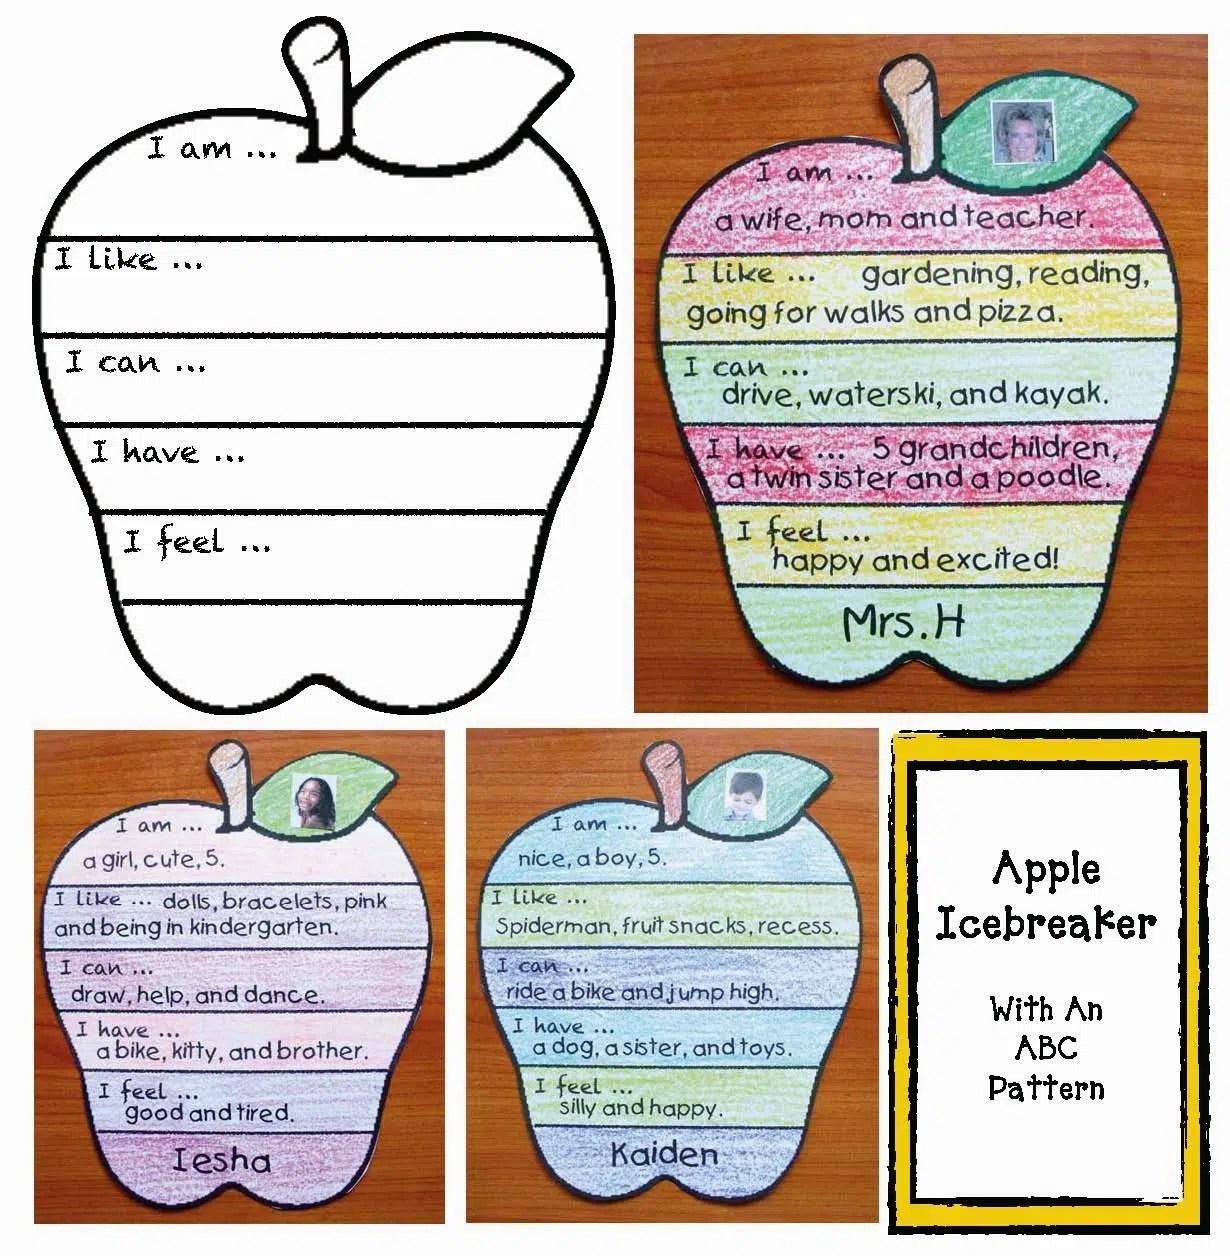 Back To School Apple Icebreaker